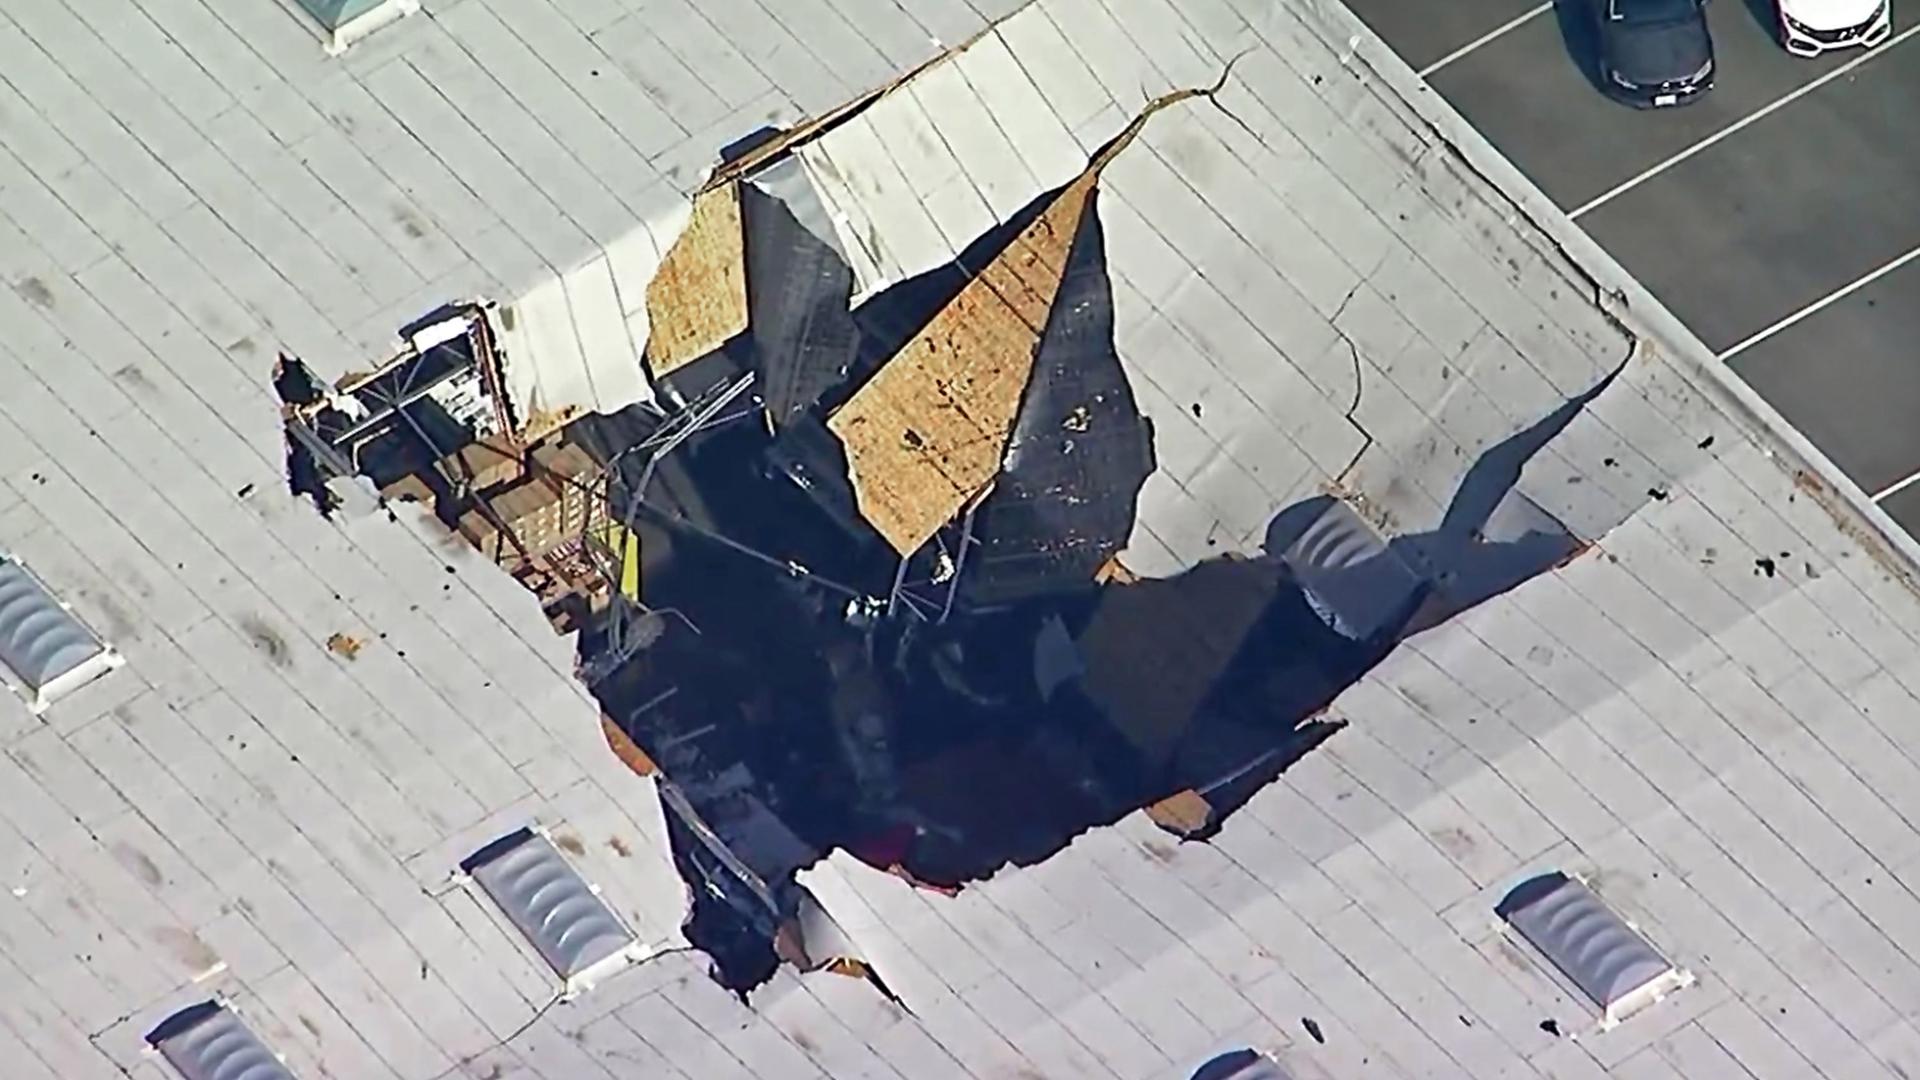 california fighter jet crash 051619 AP_1558059159017